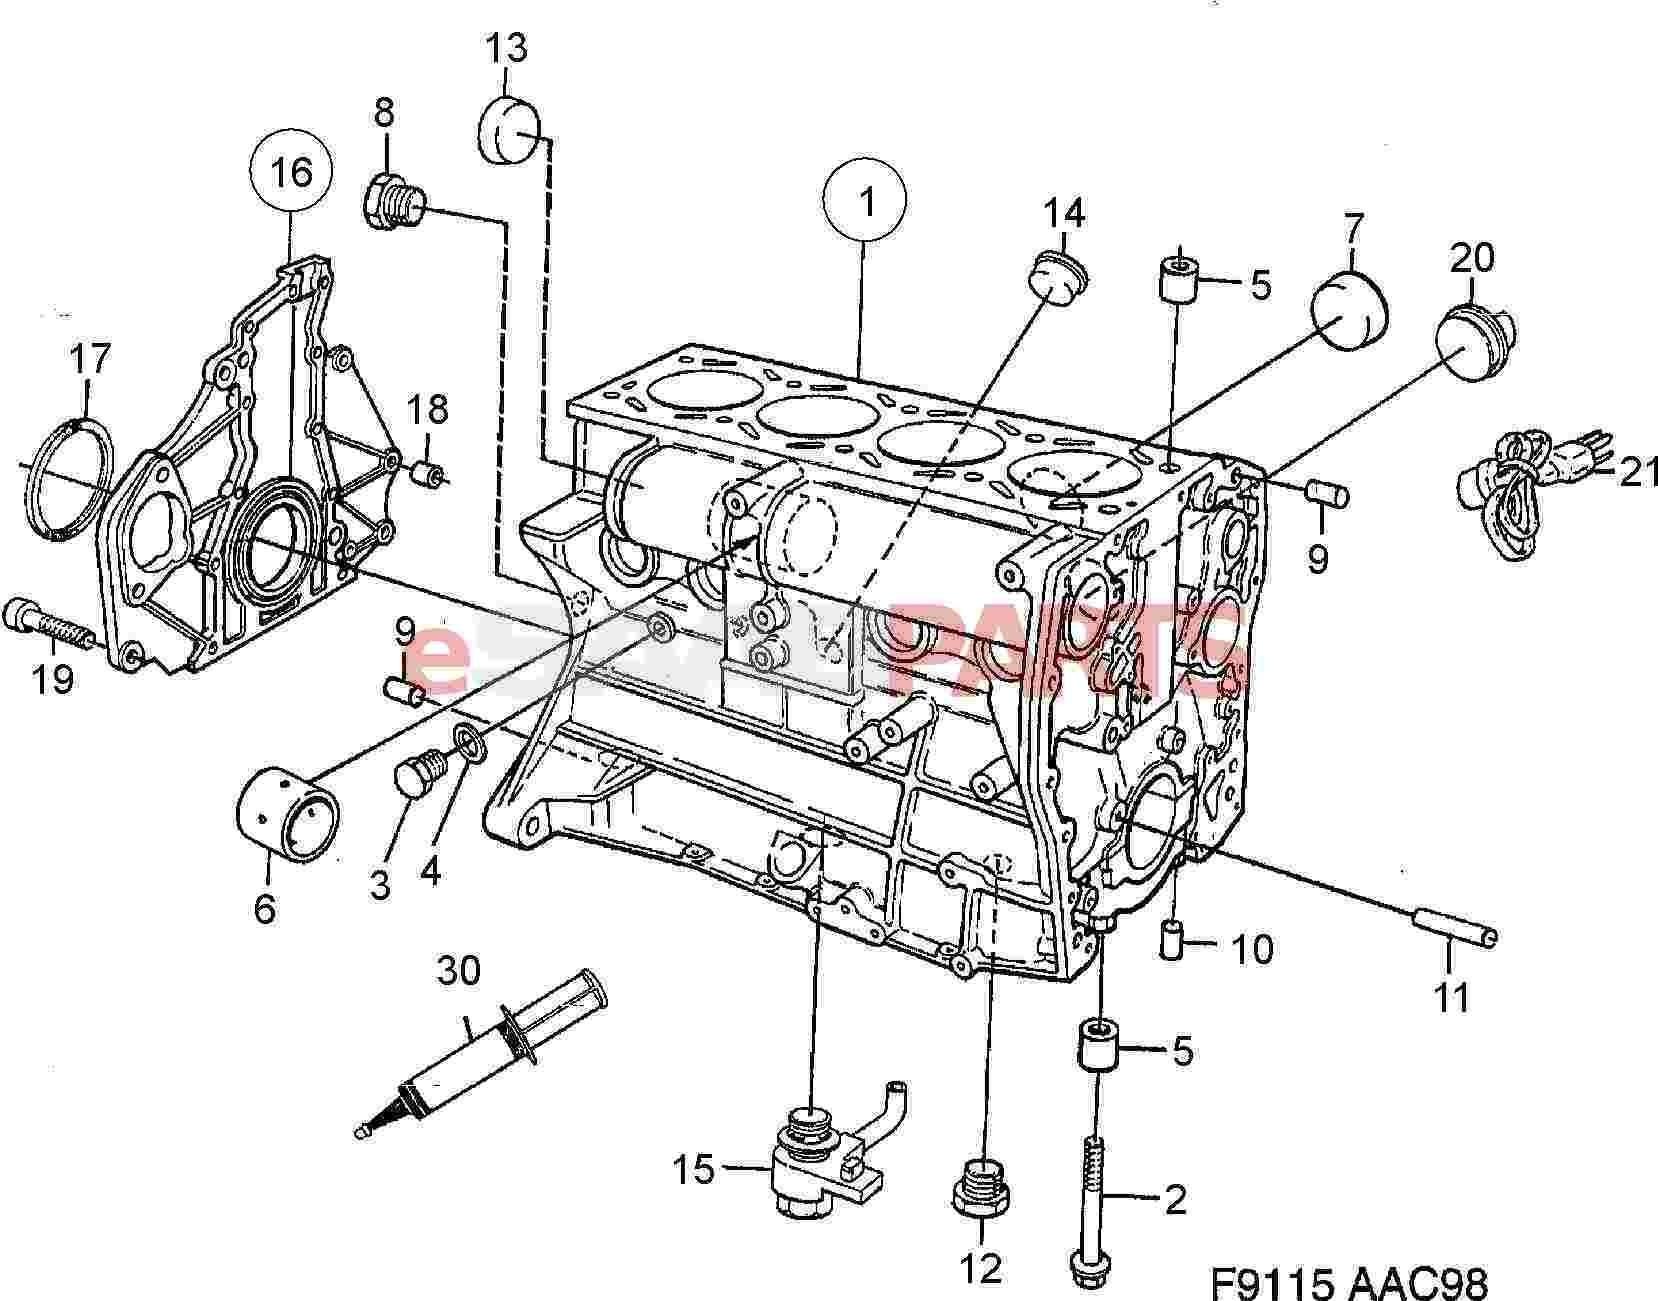 Land Rover Lr3 Wiring Diagram Pdf Moreover 1997 Land Rover Discovery